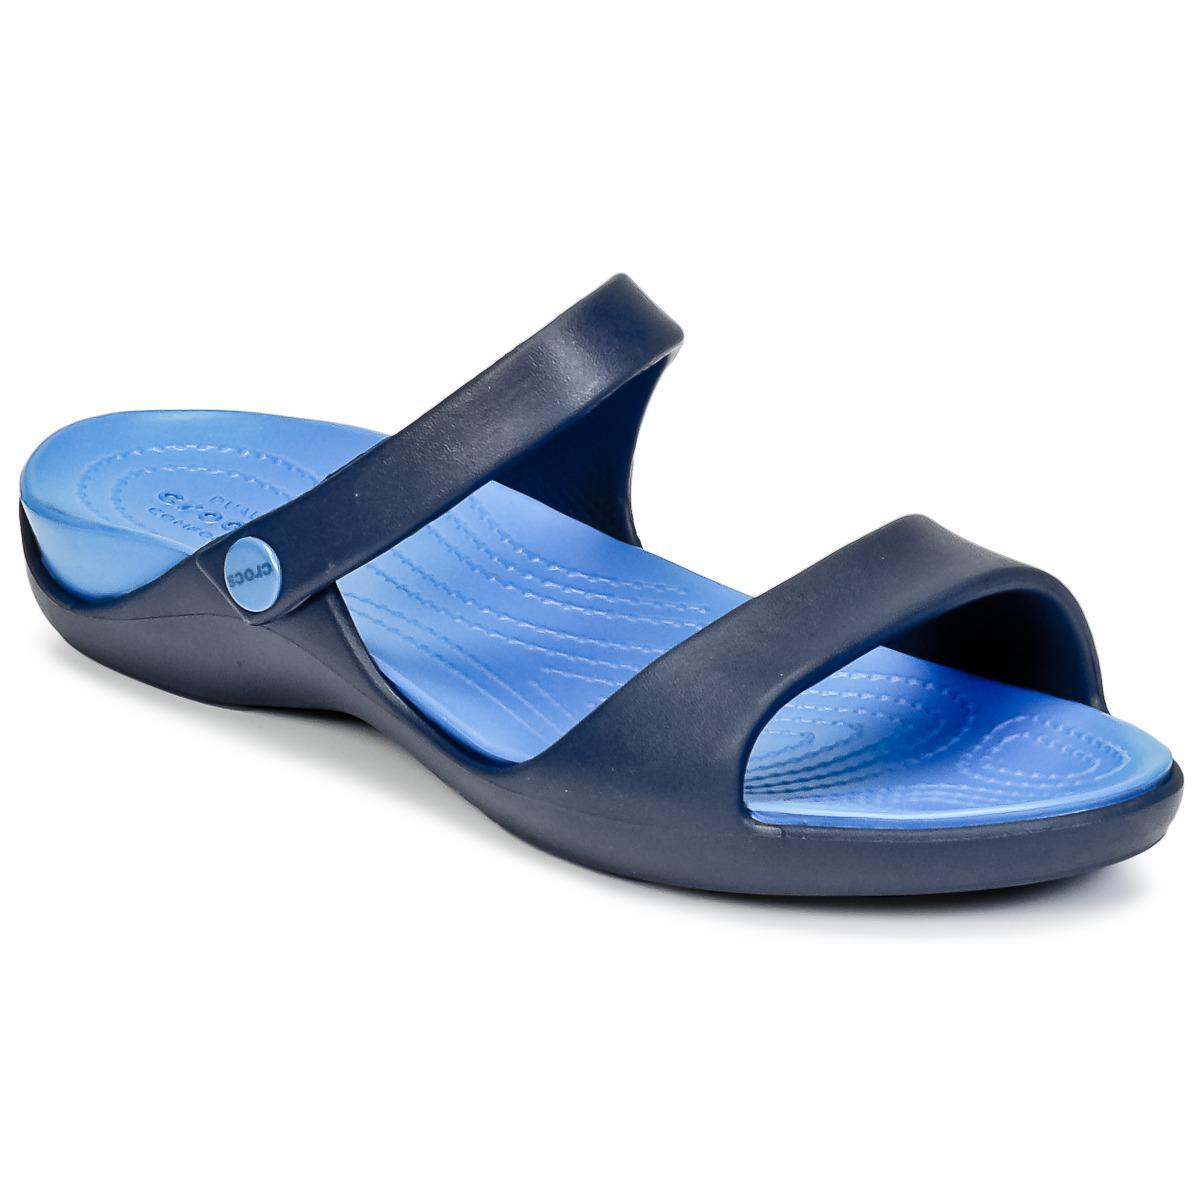 83a3af59a394 Crocs™ Cleo V Women s Sandals In Blue in Blue - Lyst